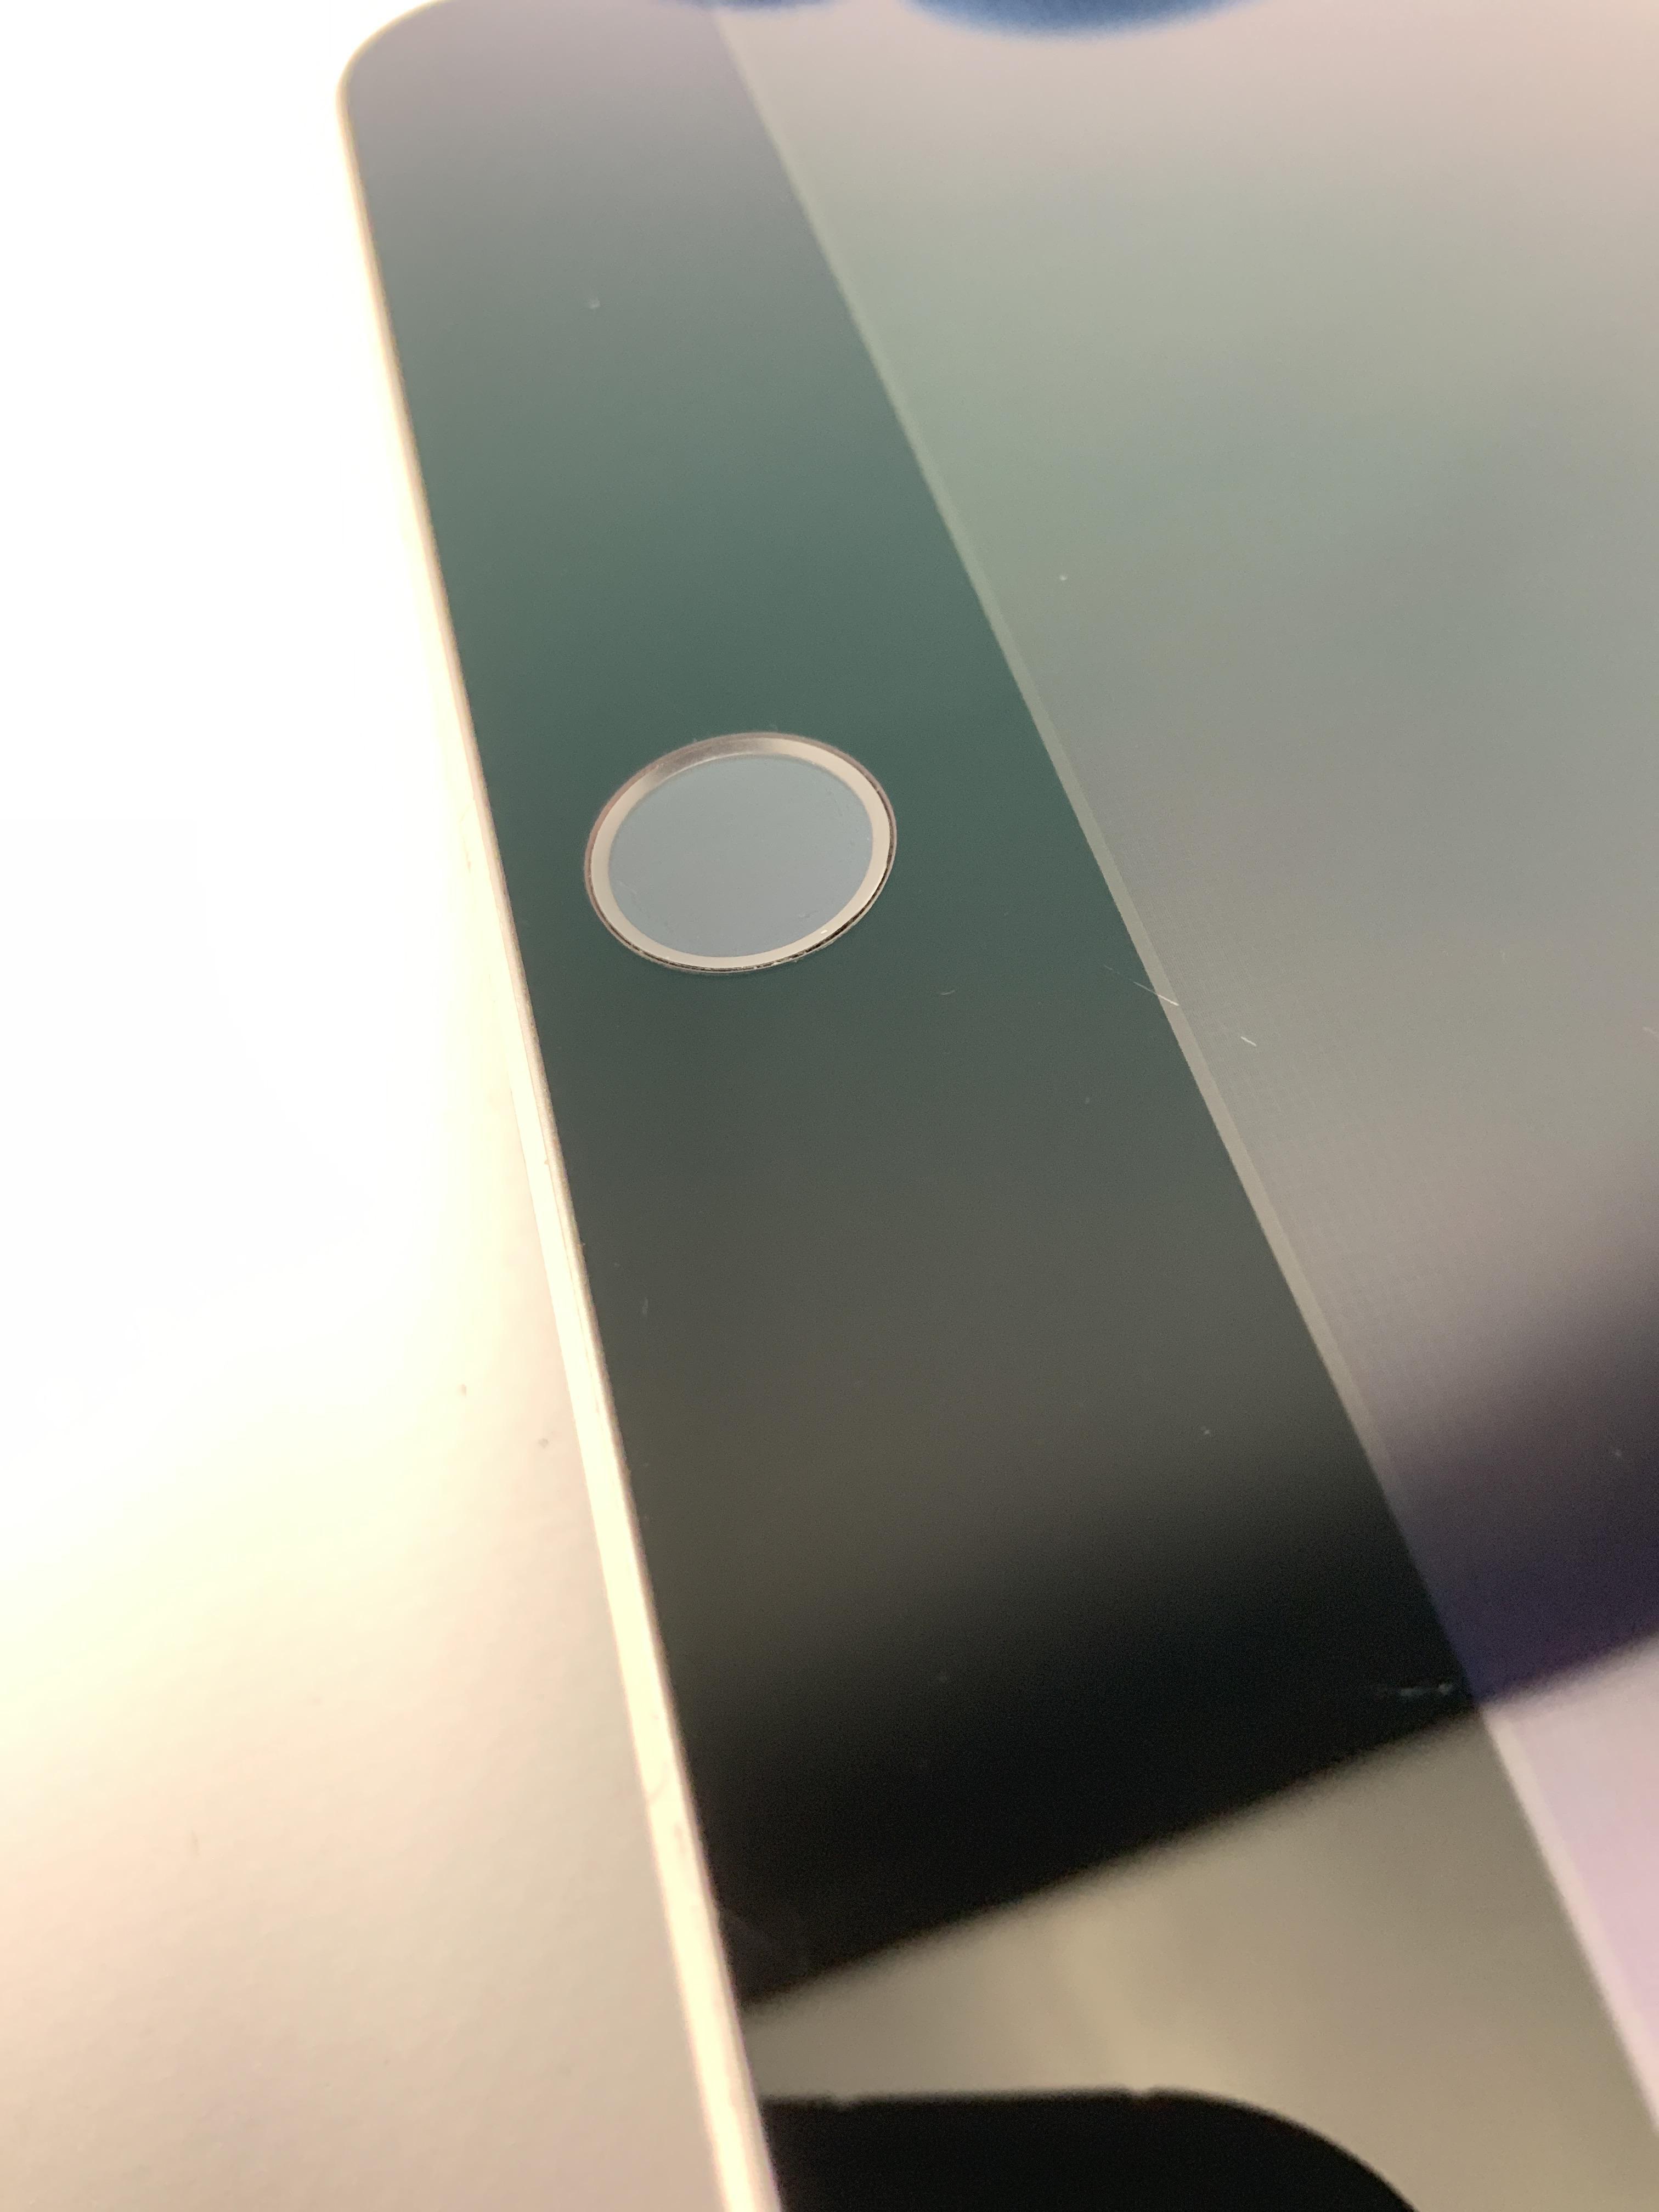 iPad mini 4 Wi-Fi + Cellular 64GB, 64GB, Space Gray, imagen 3